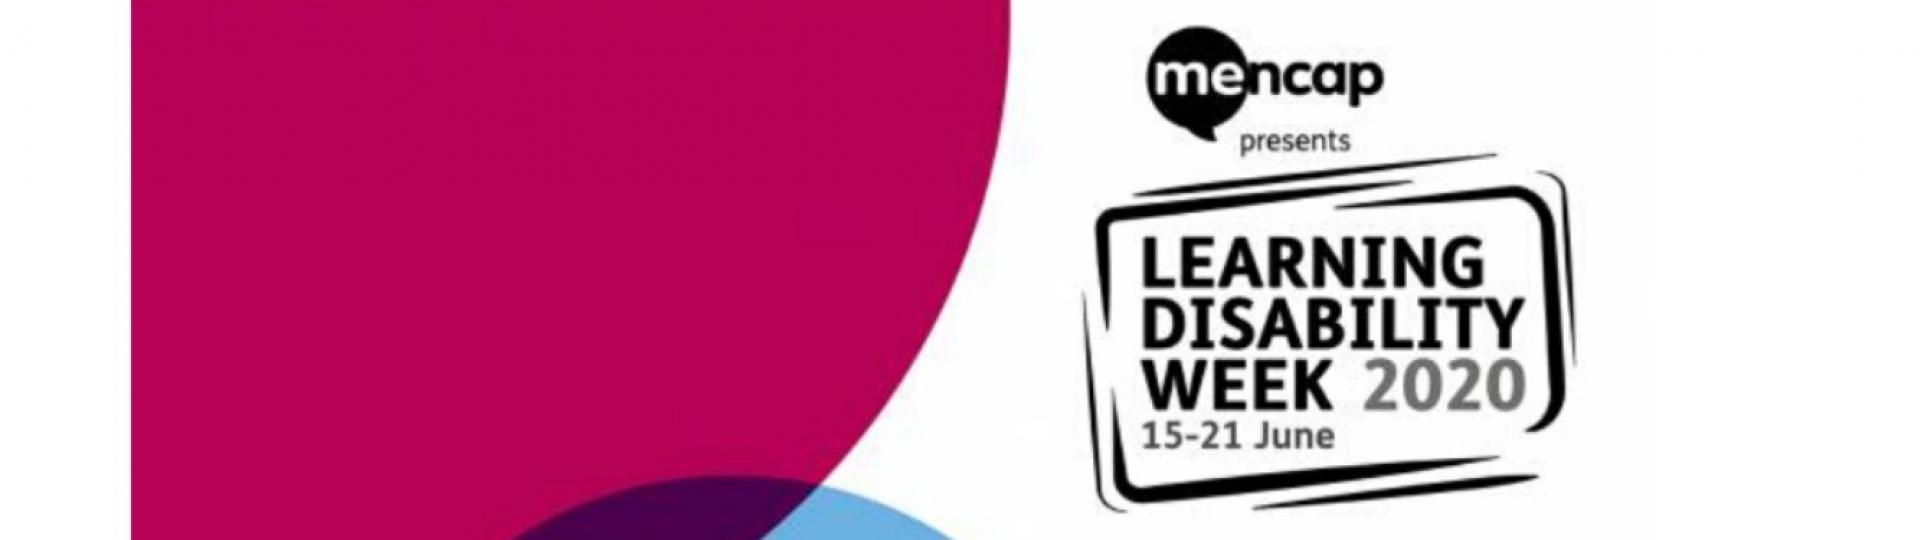 learning disability week logo